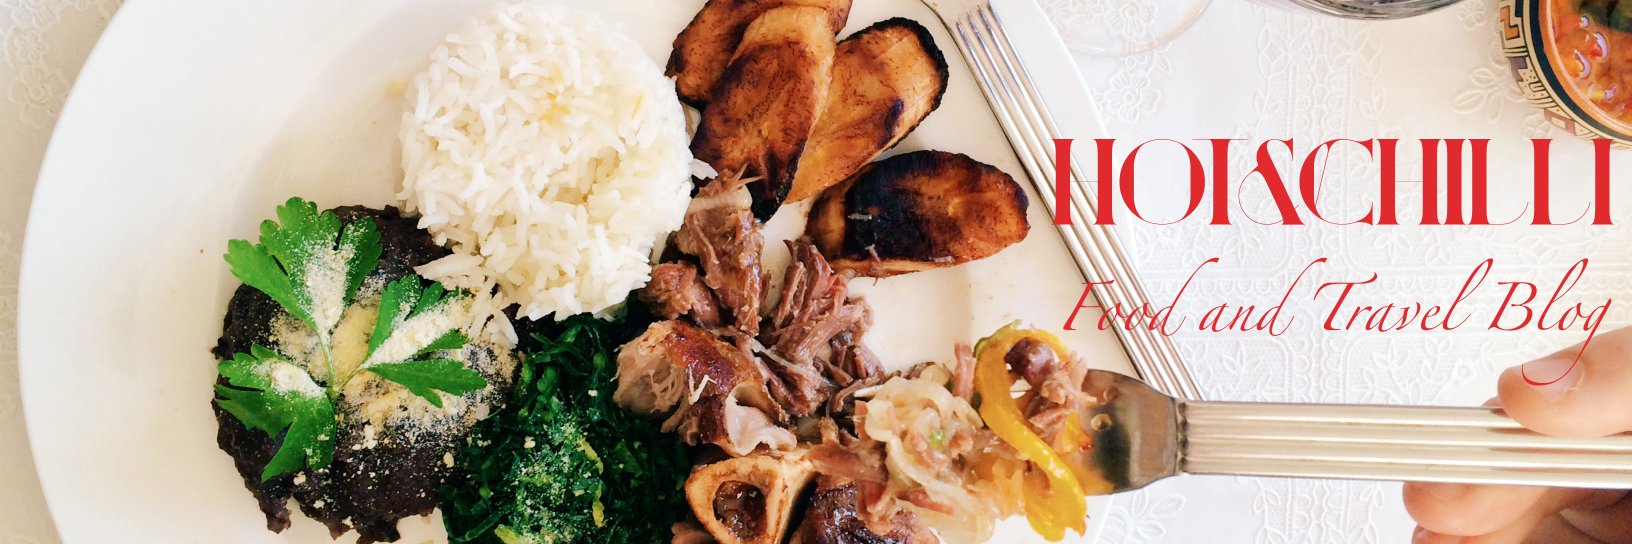 Amazing Michelin Star restaurant Refectorio @AbadiaRetuerta gorgeous dinner- part 1 #luxuryhotel… https://t.co/sQ7tjdToAl